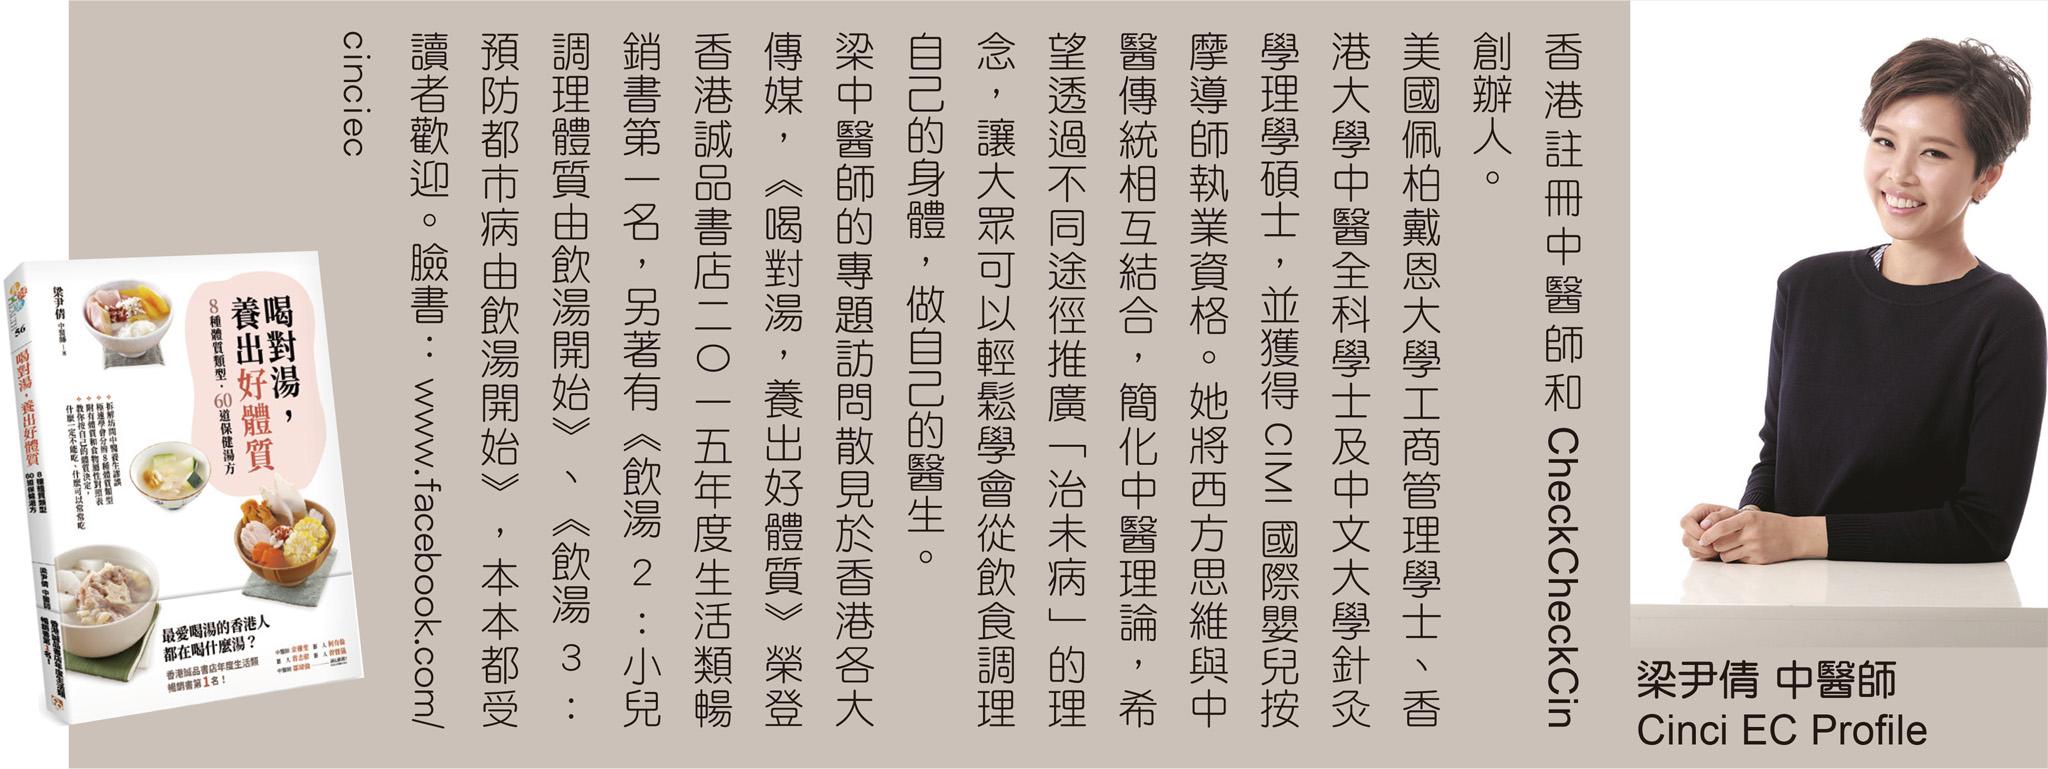 梁尹倩中醫師Profile。